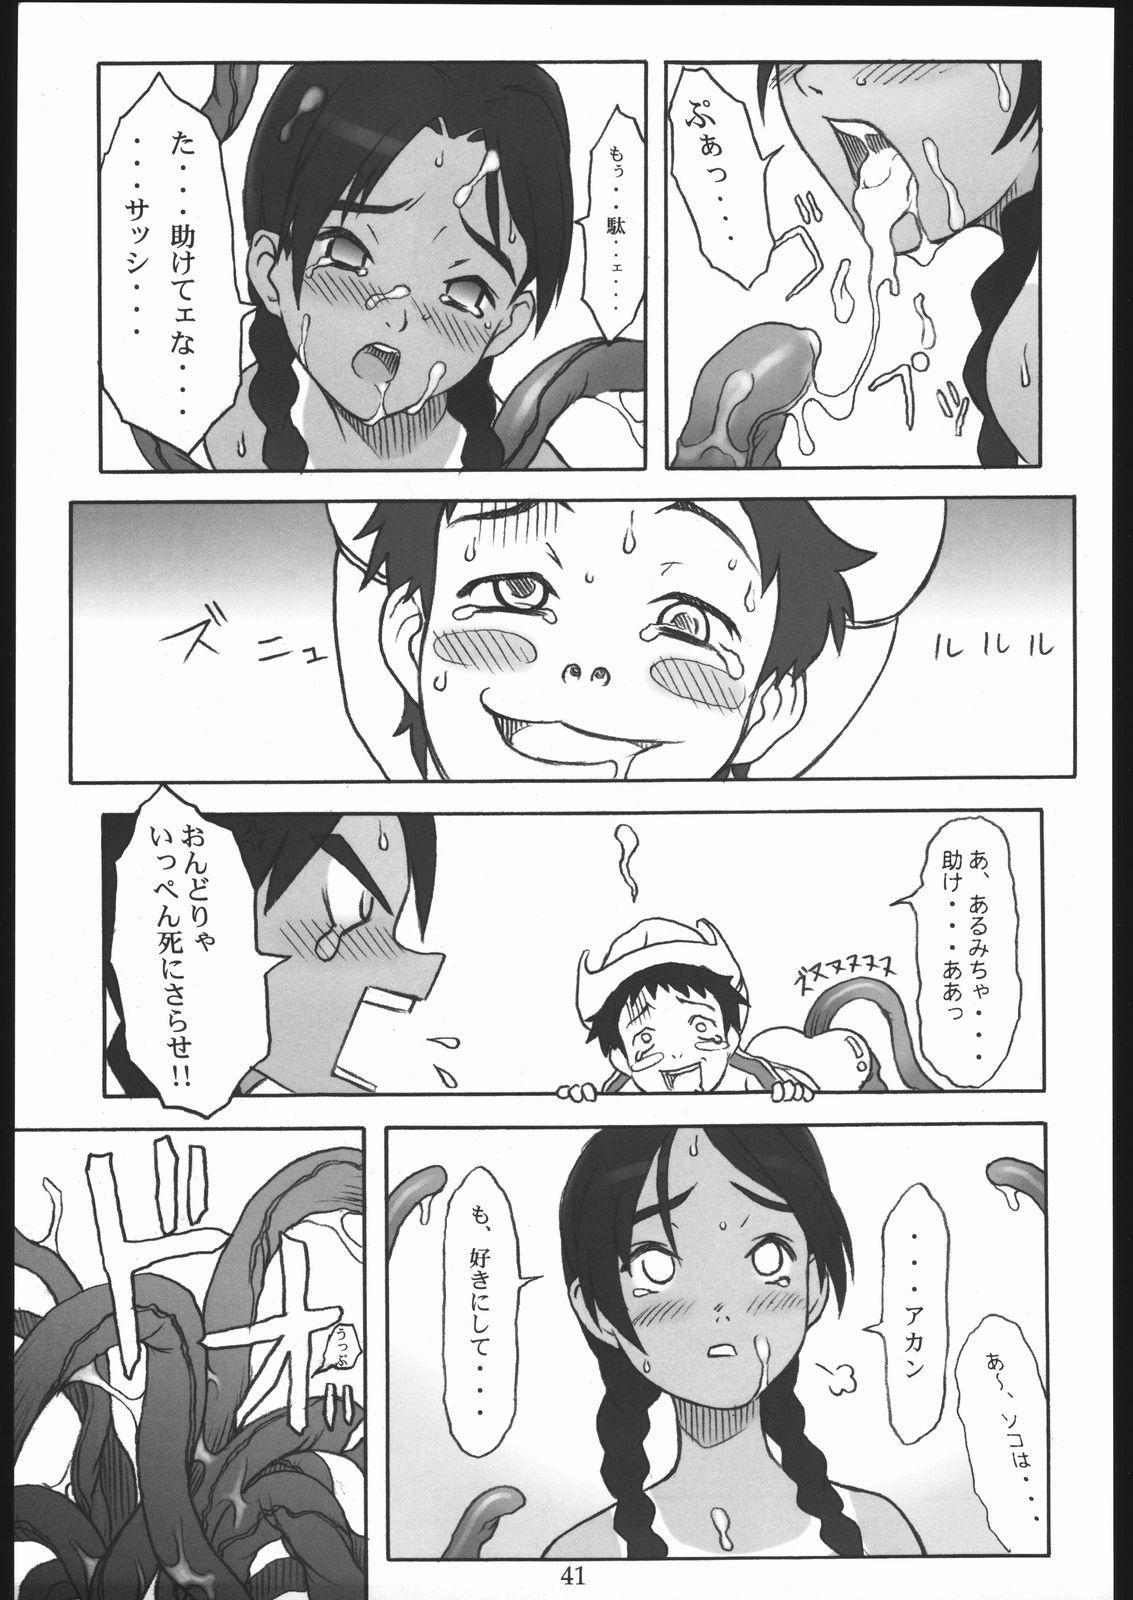 SACRIFICE Tsuji Takeshi Works Selection vol. 2 38